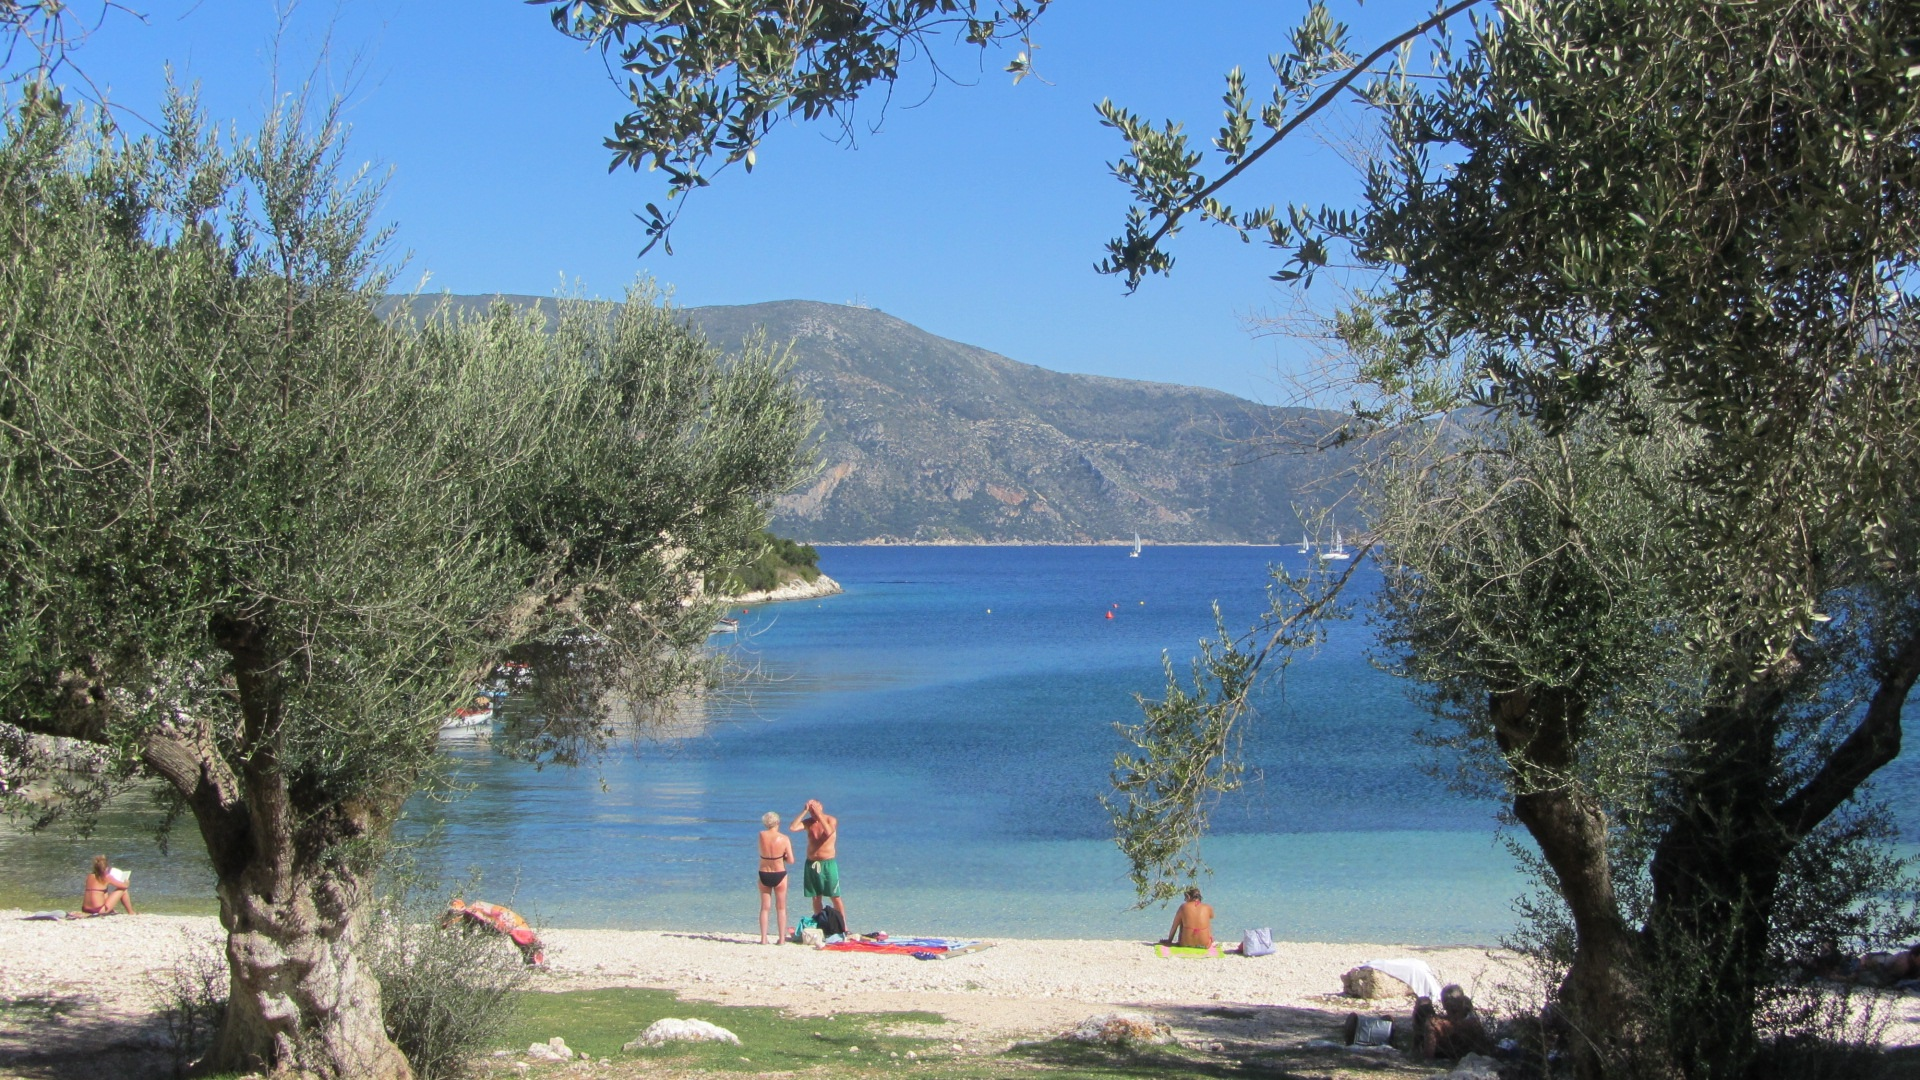 Gluten Free Paradise In Greece With Vegetarian Options Trapezaki Kefalonia Gluten Free